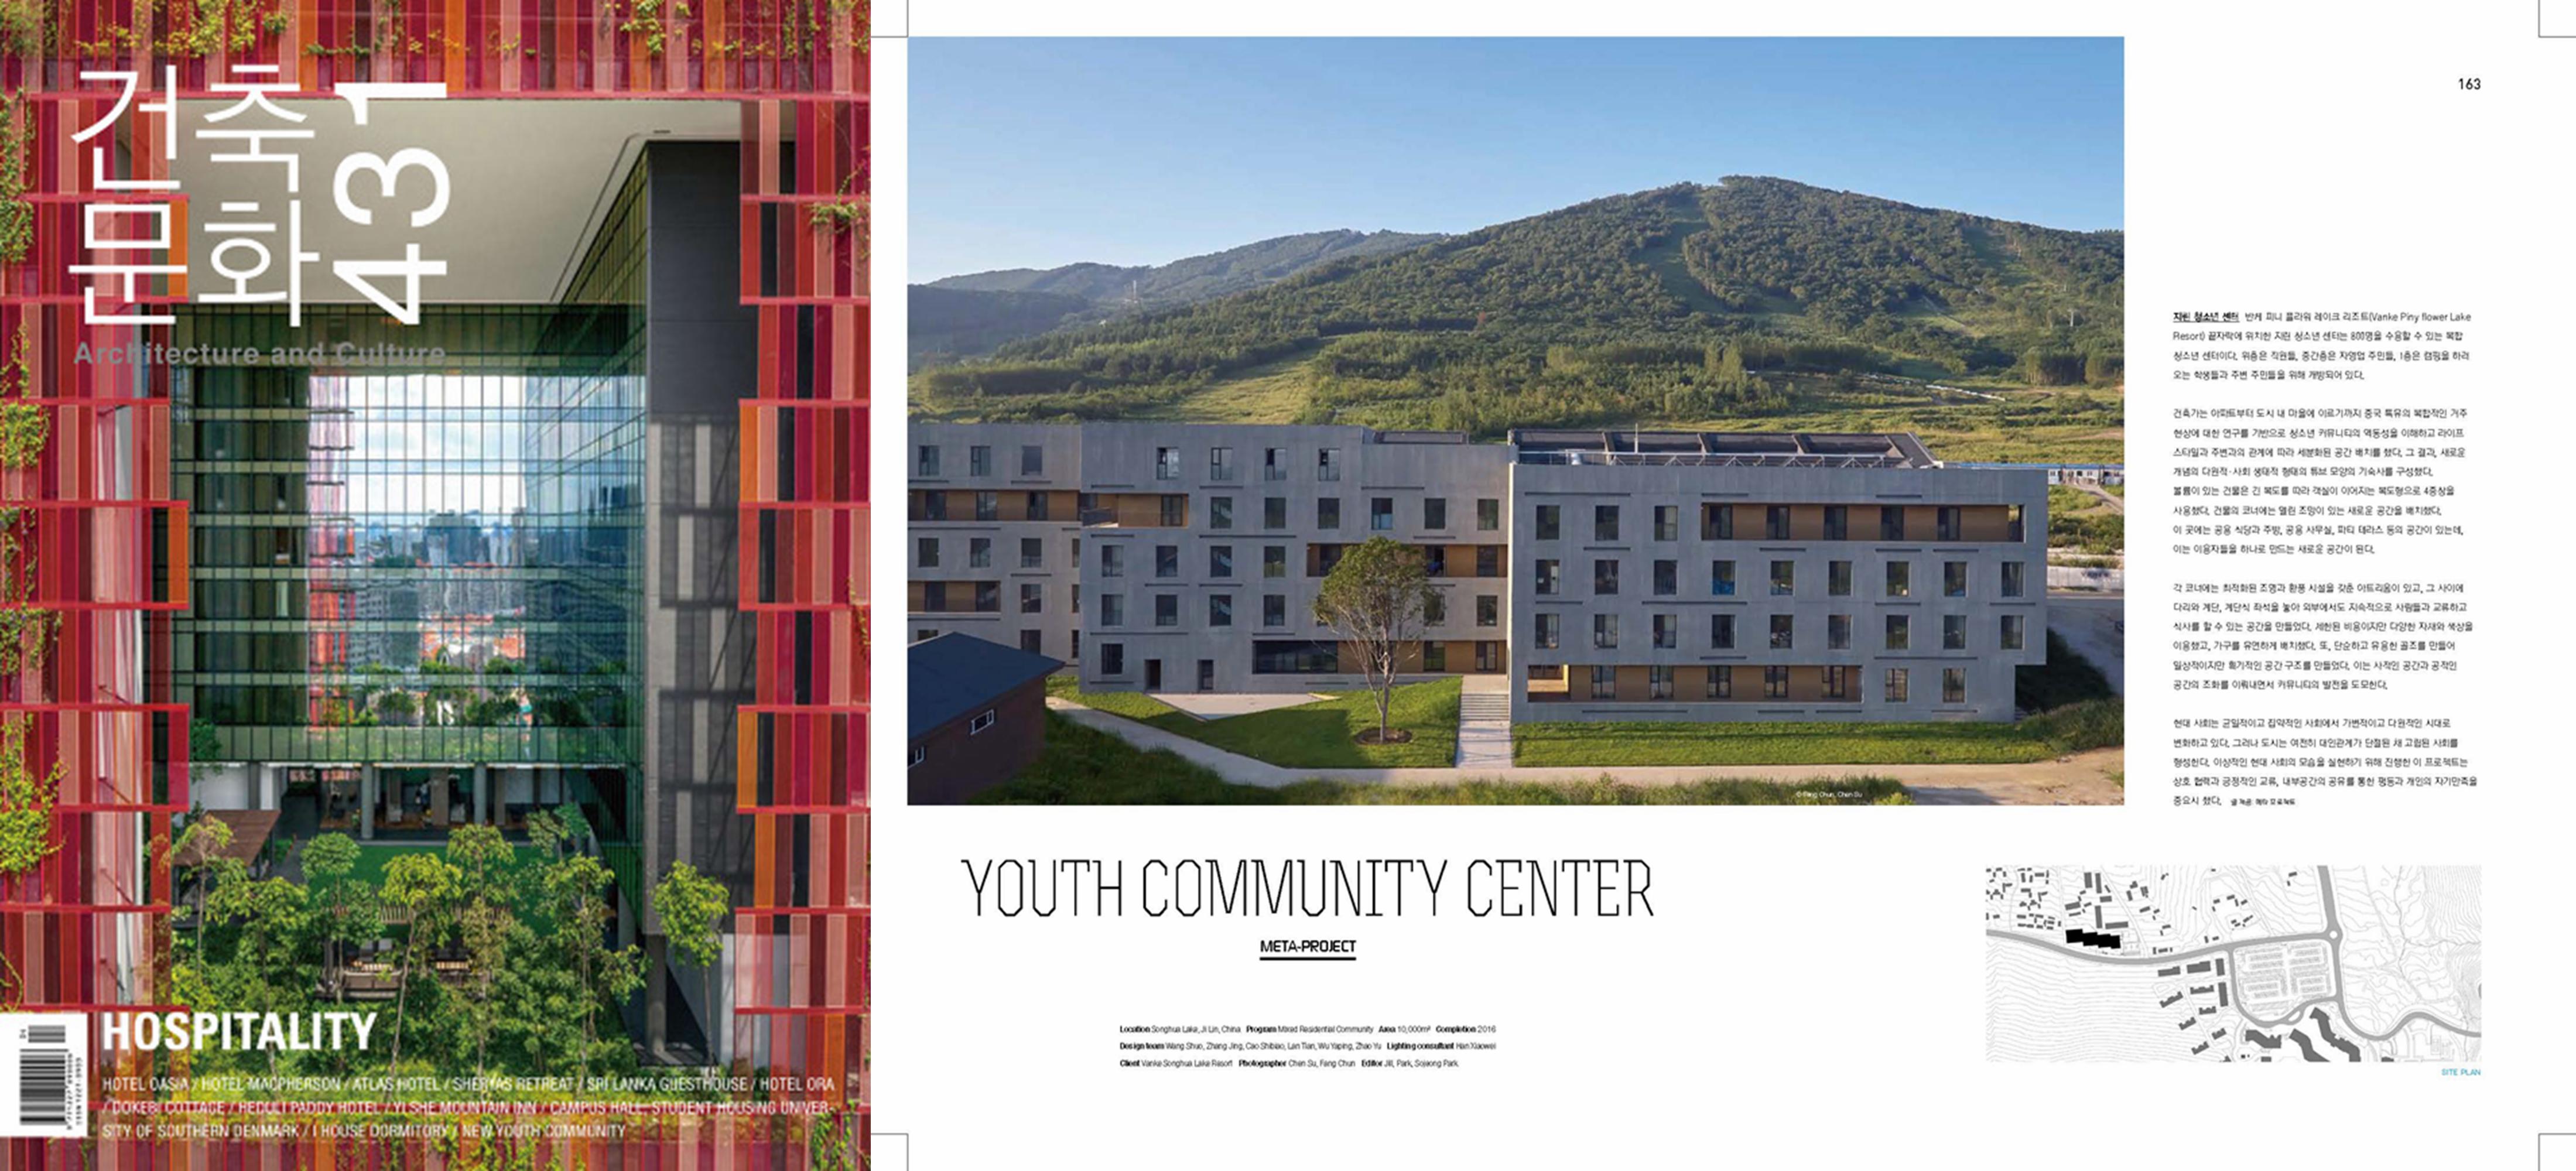 new youth commune wins 2018 iaa award